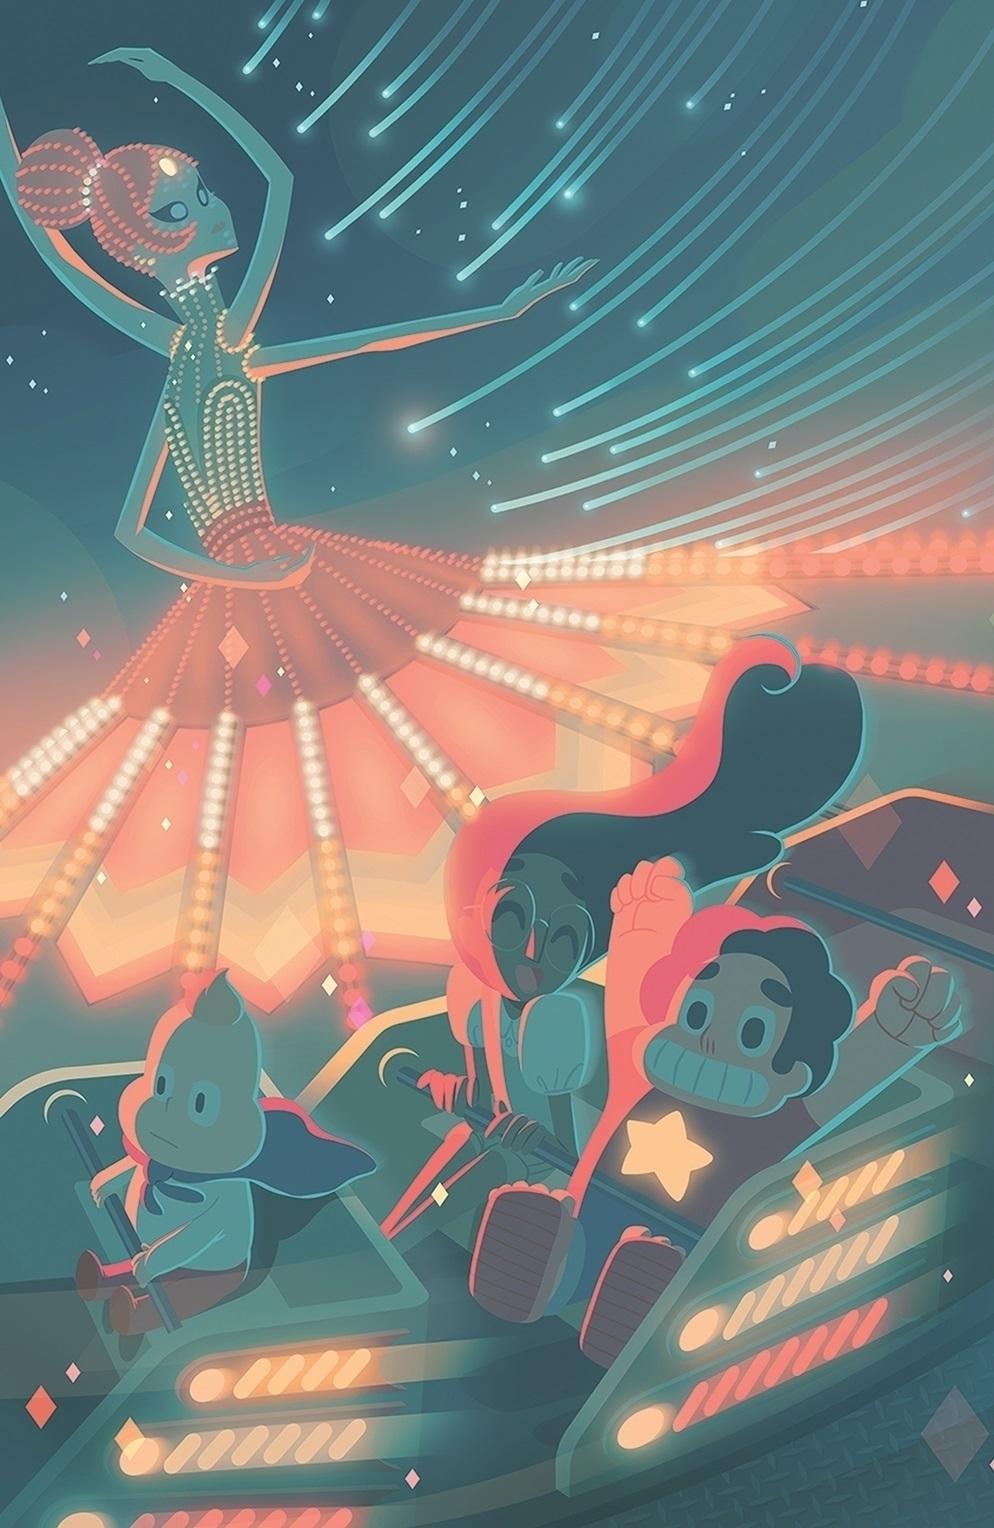 Cover Steven Universe issue - 3 - caltsoudas | ello